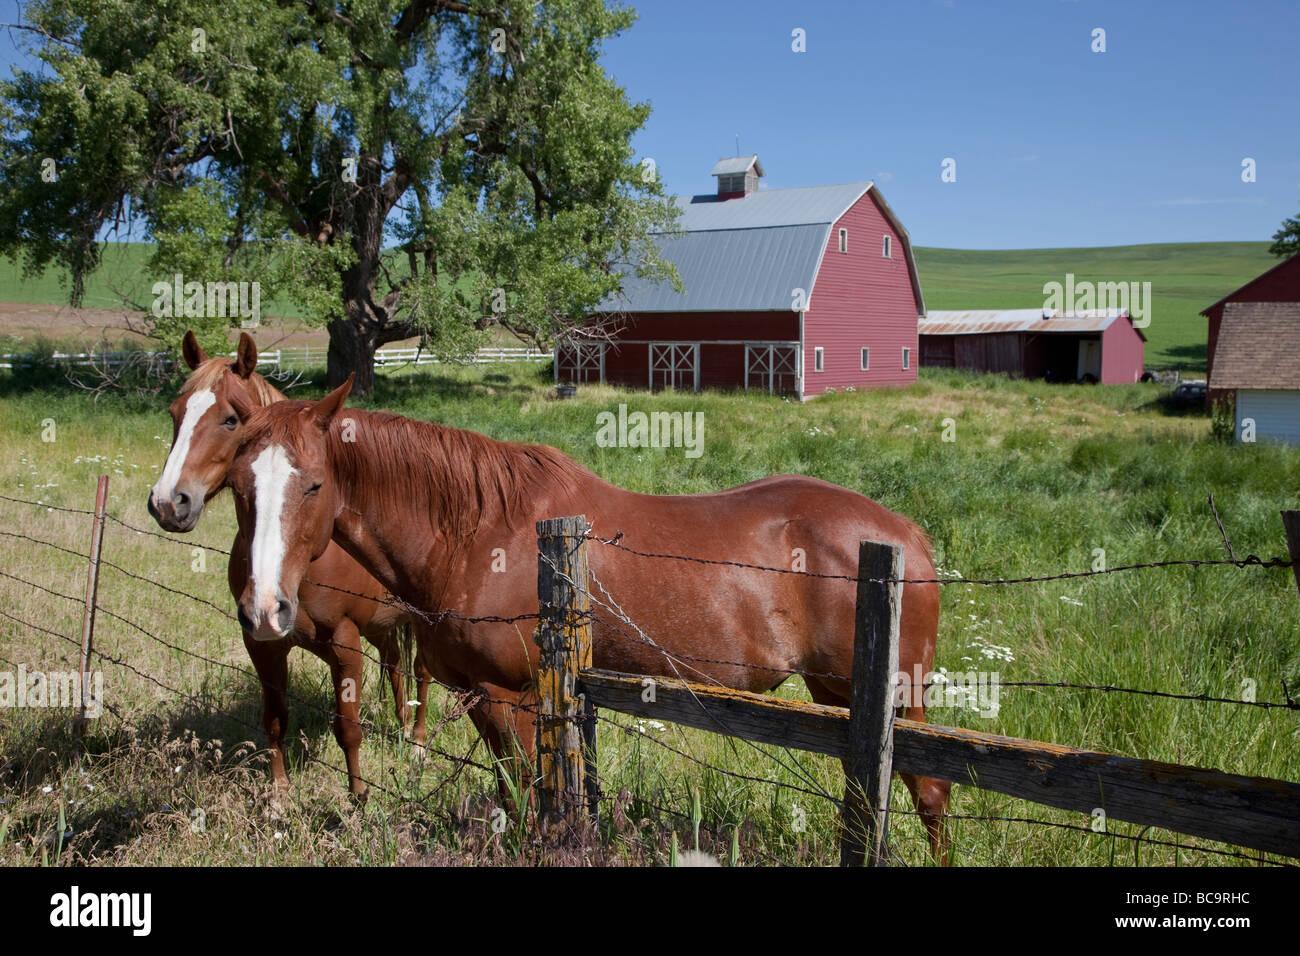 Near Pullman, Washington, in Palouse Country, Southeastern Washington State. Horses and Red Barn. Stock Photo